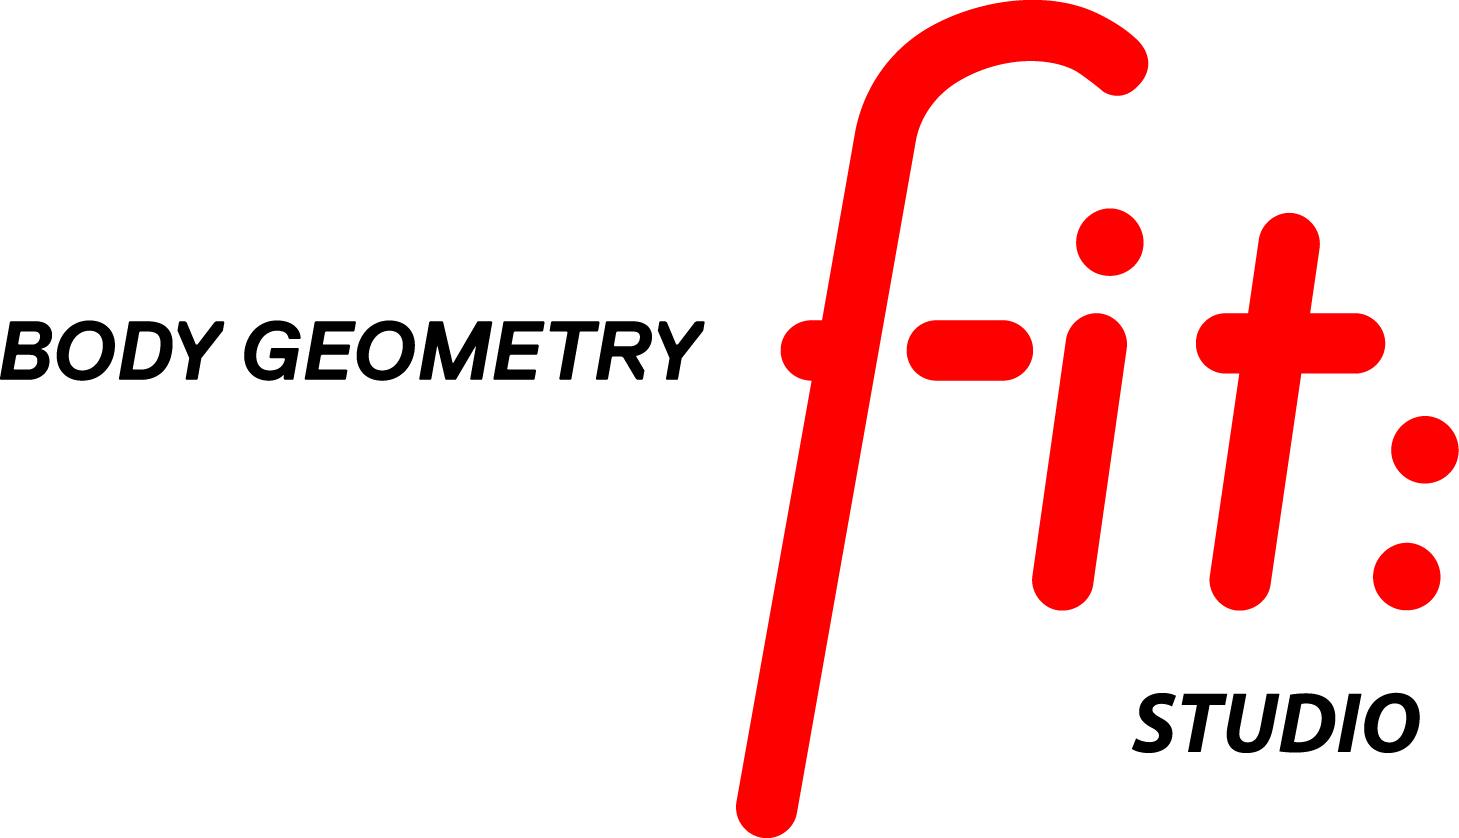 Body Geometry